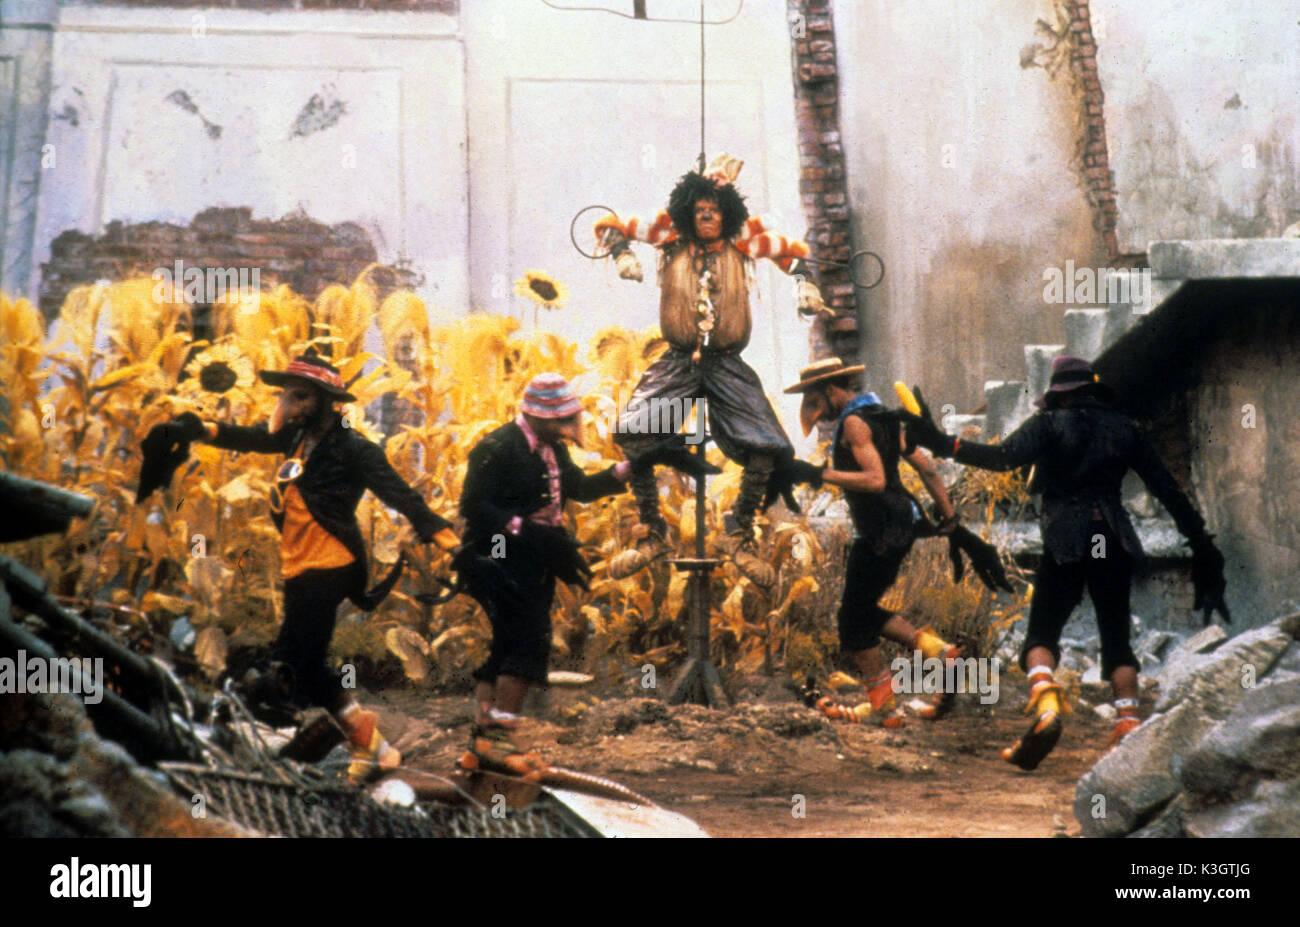 THE WIZ MICHAEL JACKSON as Scarecrow Date: 1978 Stock Photo